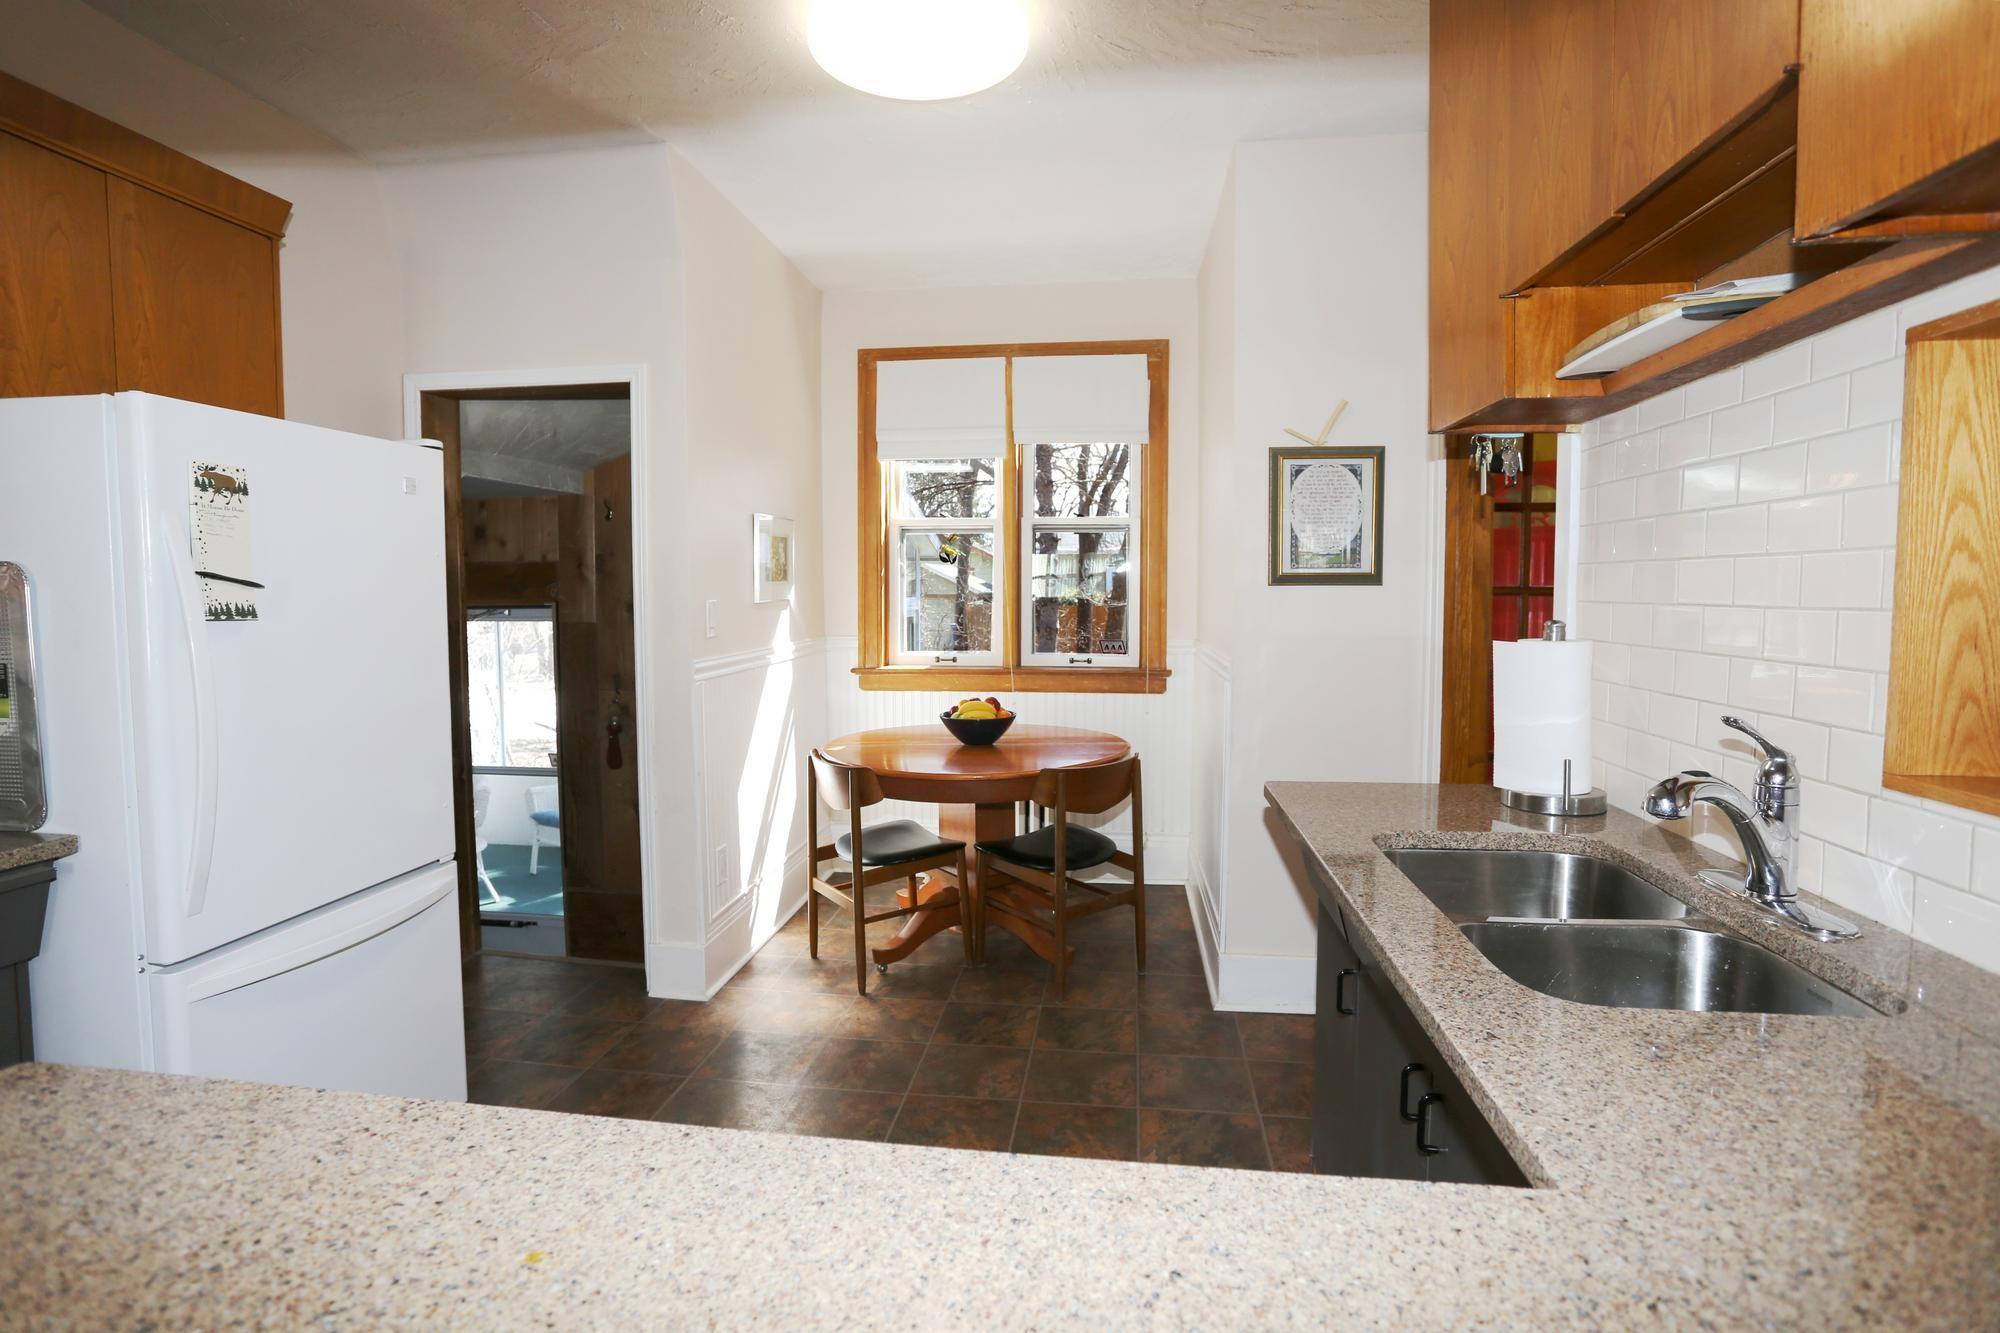 Photo 10: Photos: 109 Garfield Street South in Winnipeg: Wolseley Single Family Detached for sale (5B)  : MLS®# 1808340